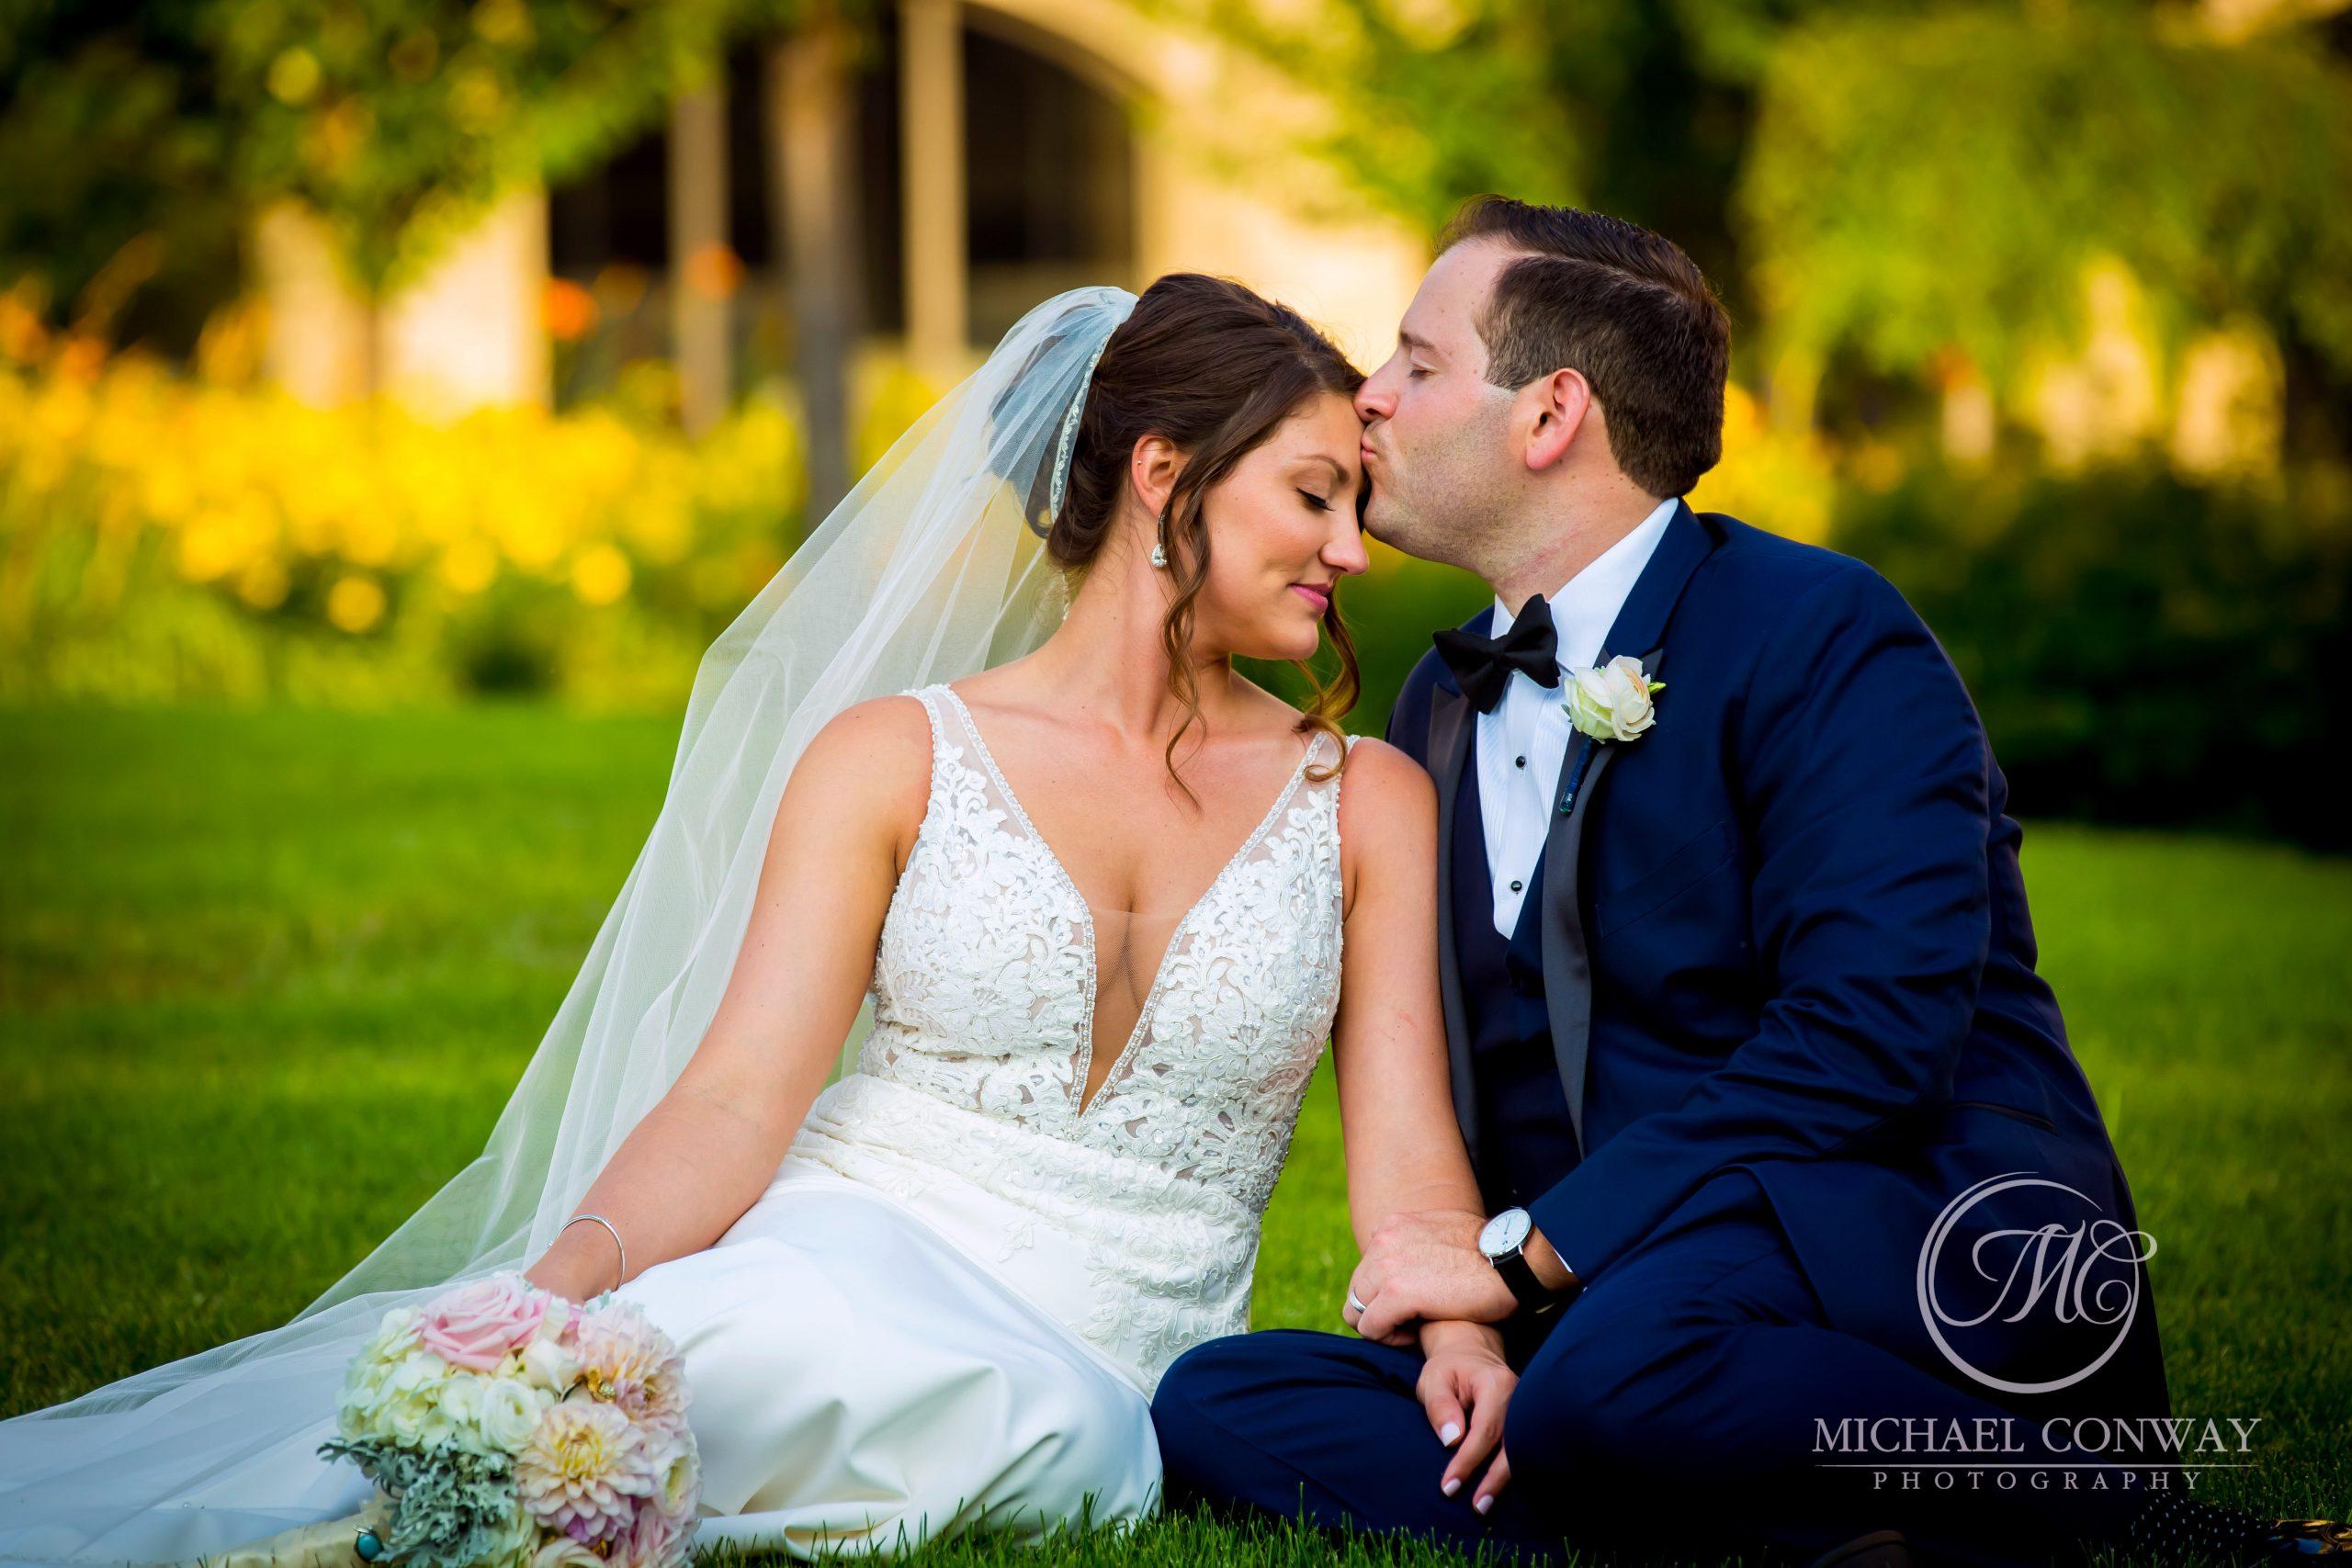 State Room Albany wedding